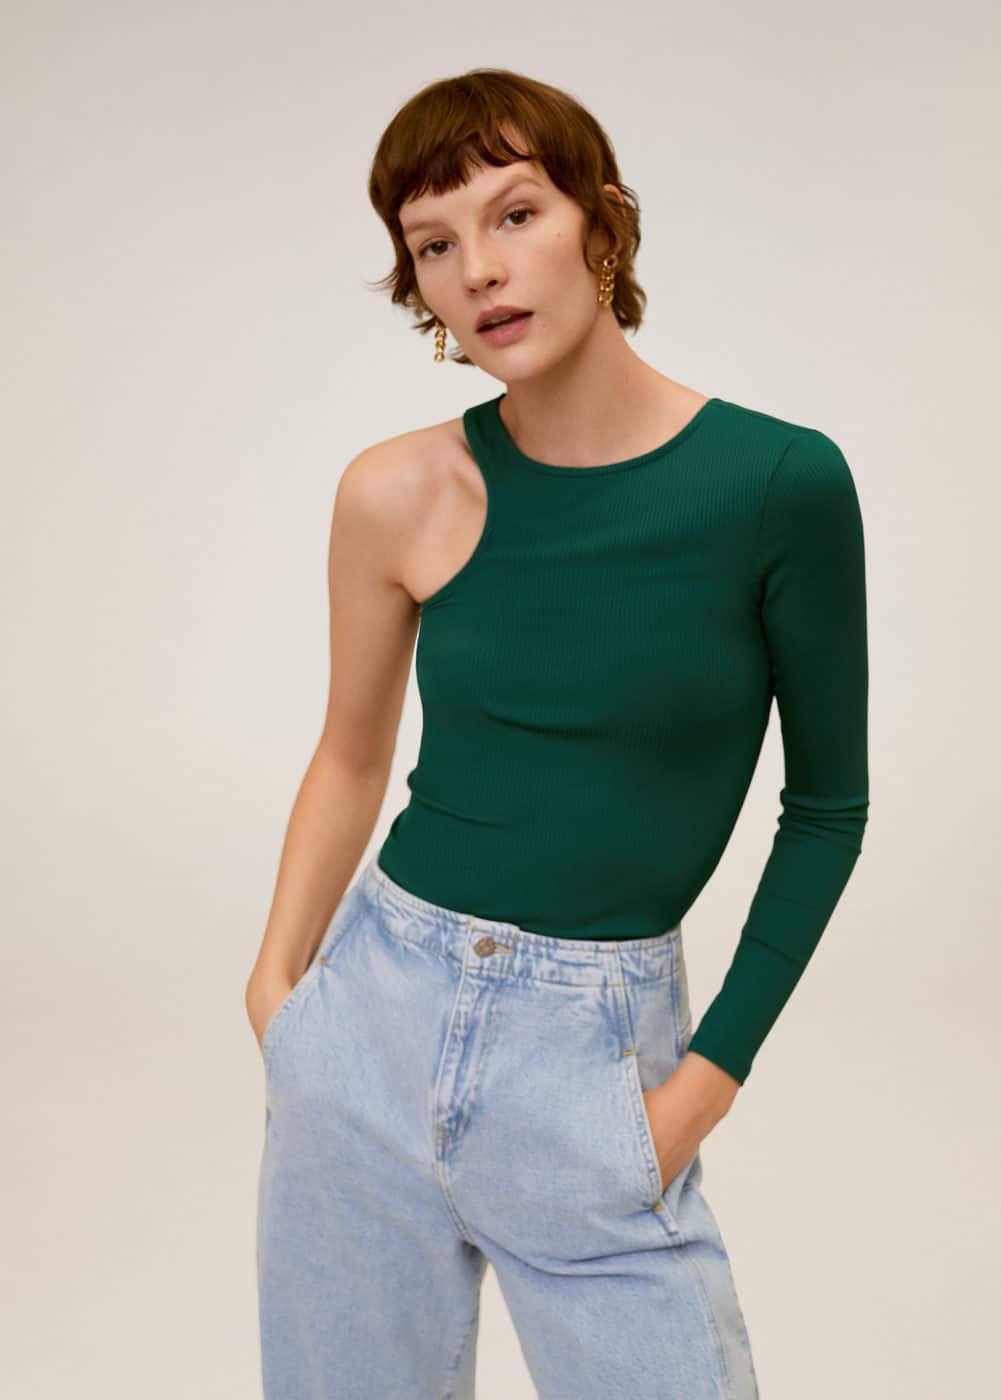 m-cut:camiseta canale asimetrica